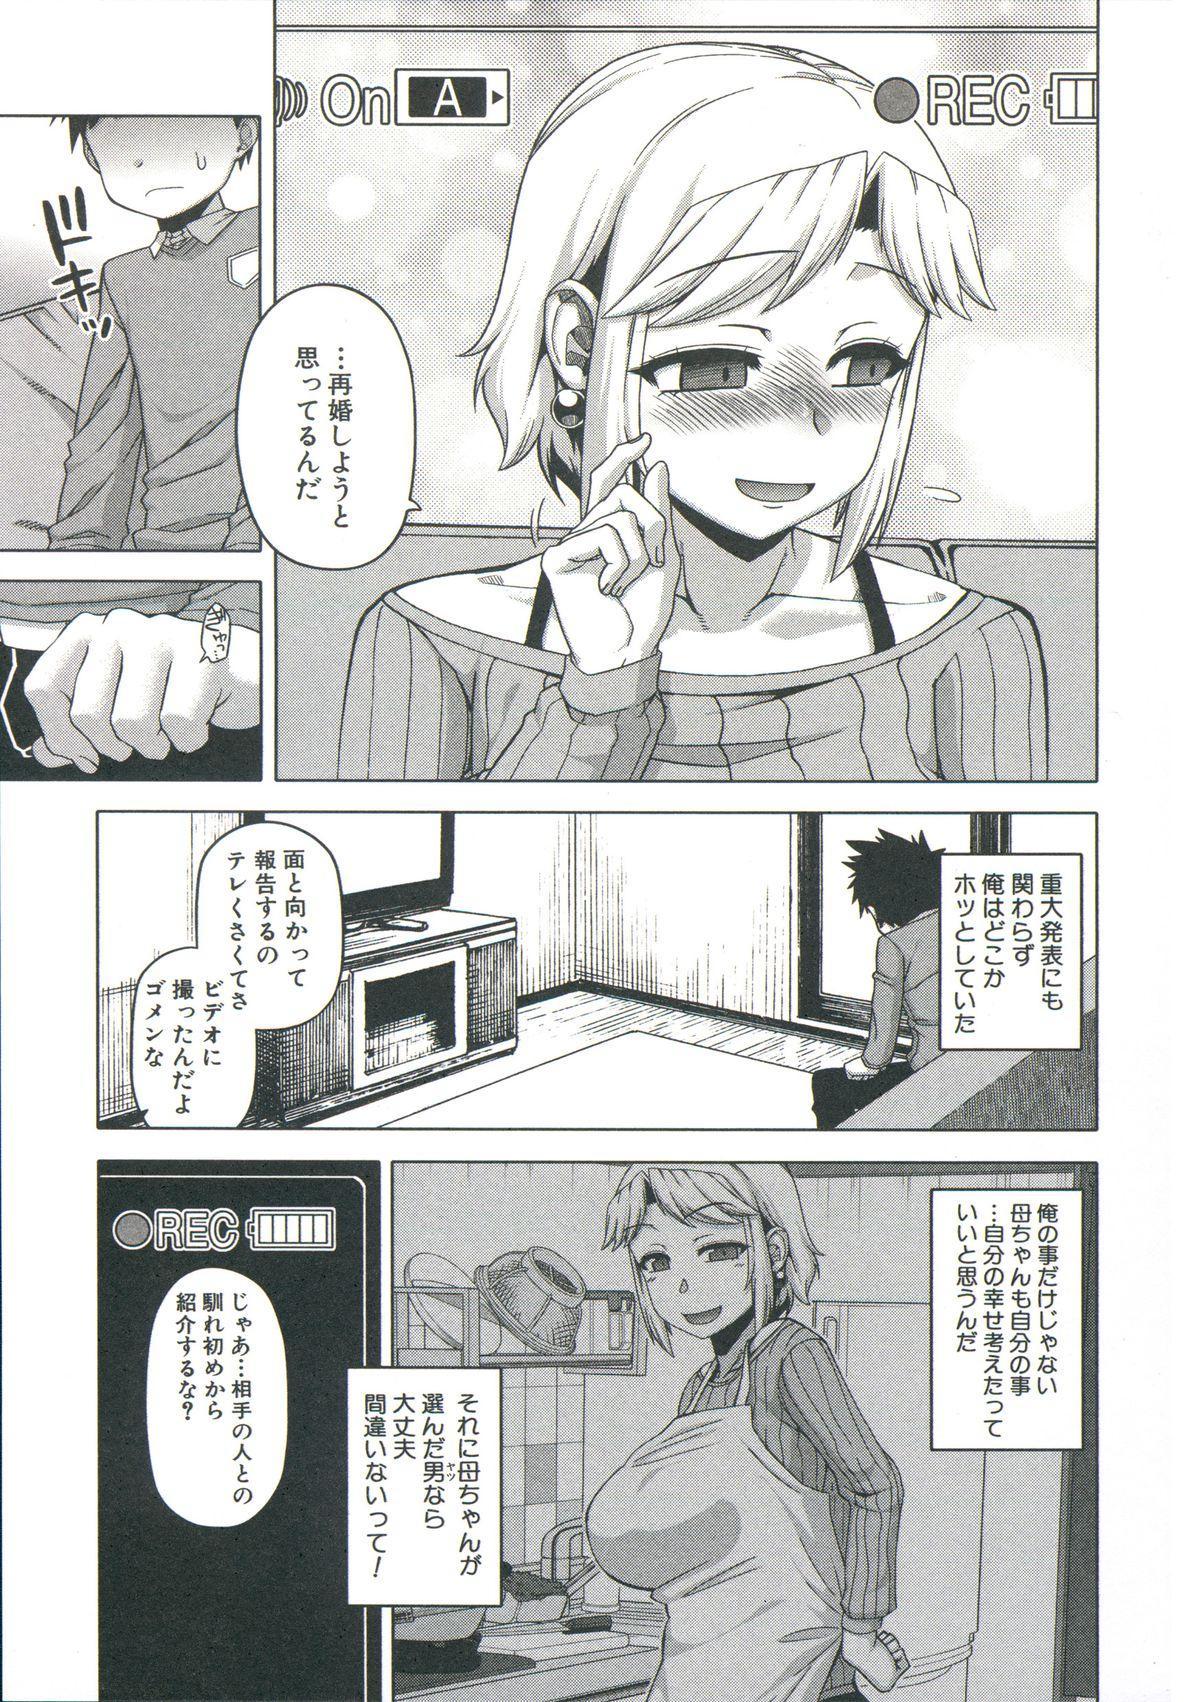 [Takatsu] Ou-sama Appli - King App 75